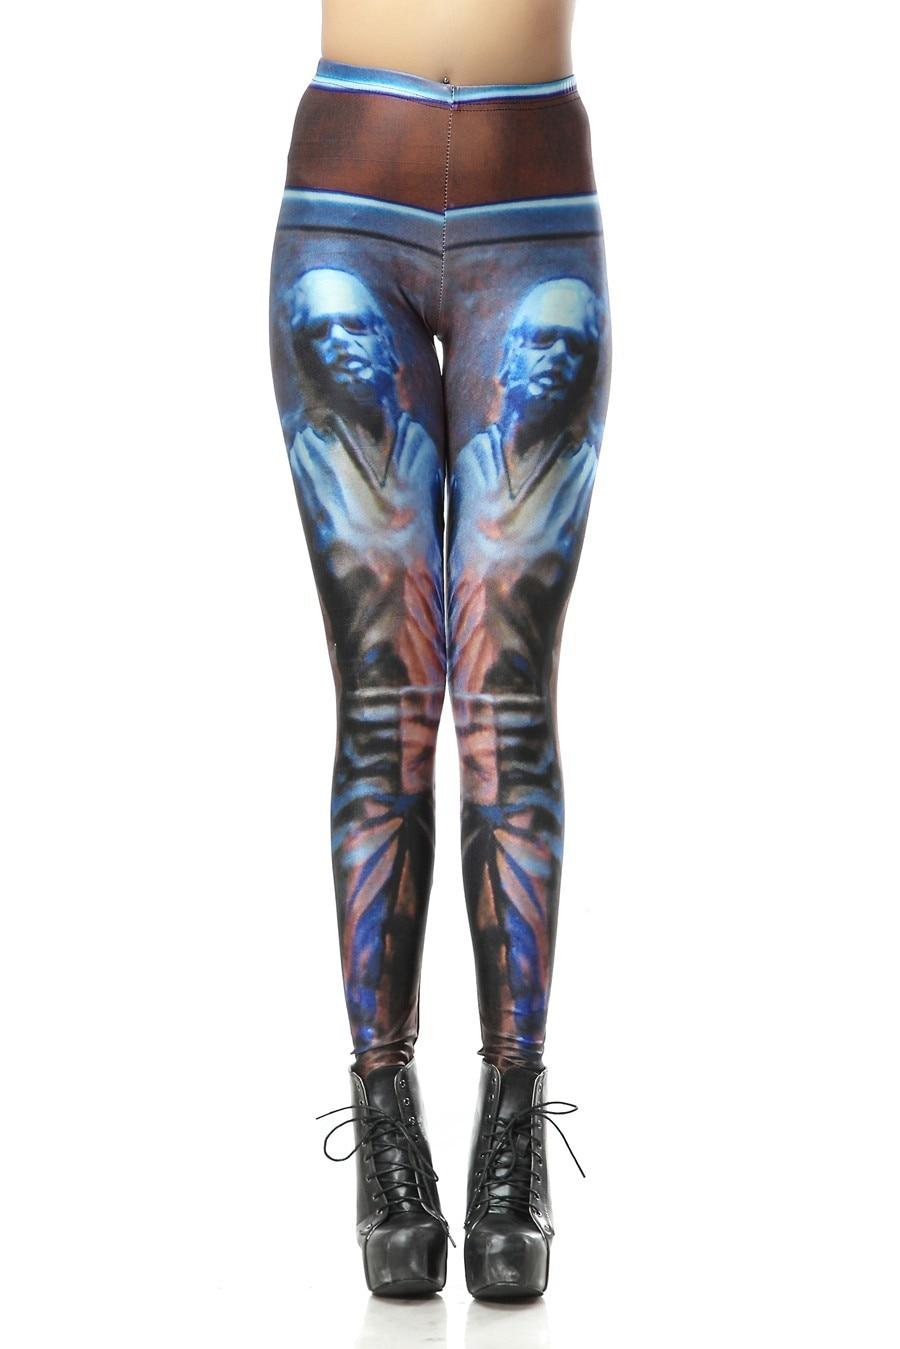 109aefc5515d8 Brand New Star Wars leggins Digital Print Woman Leggings Skinny ...